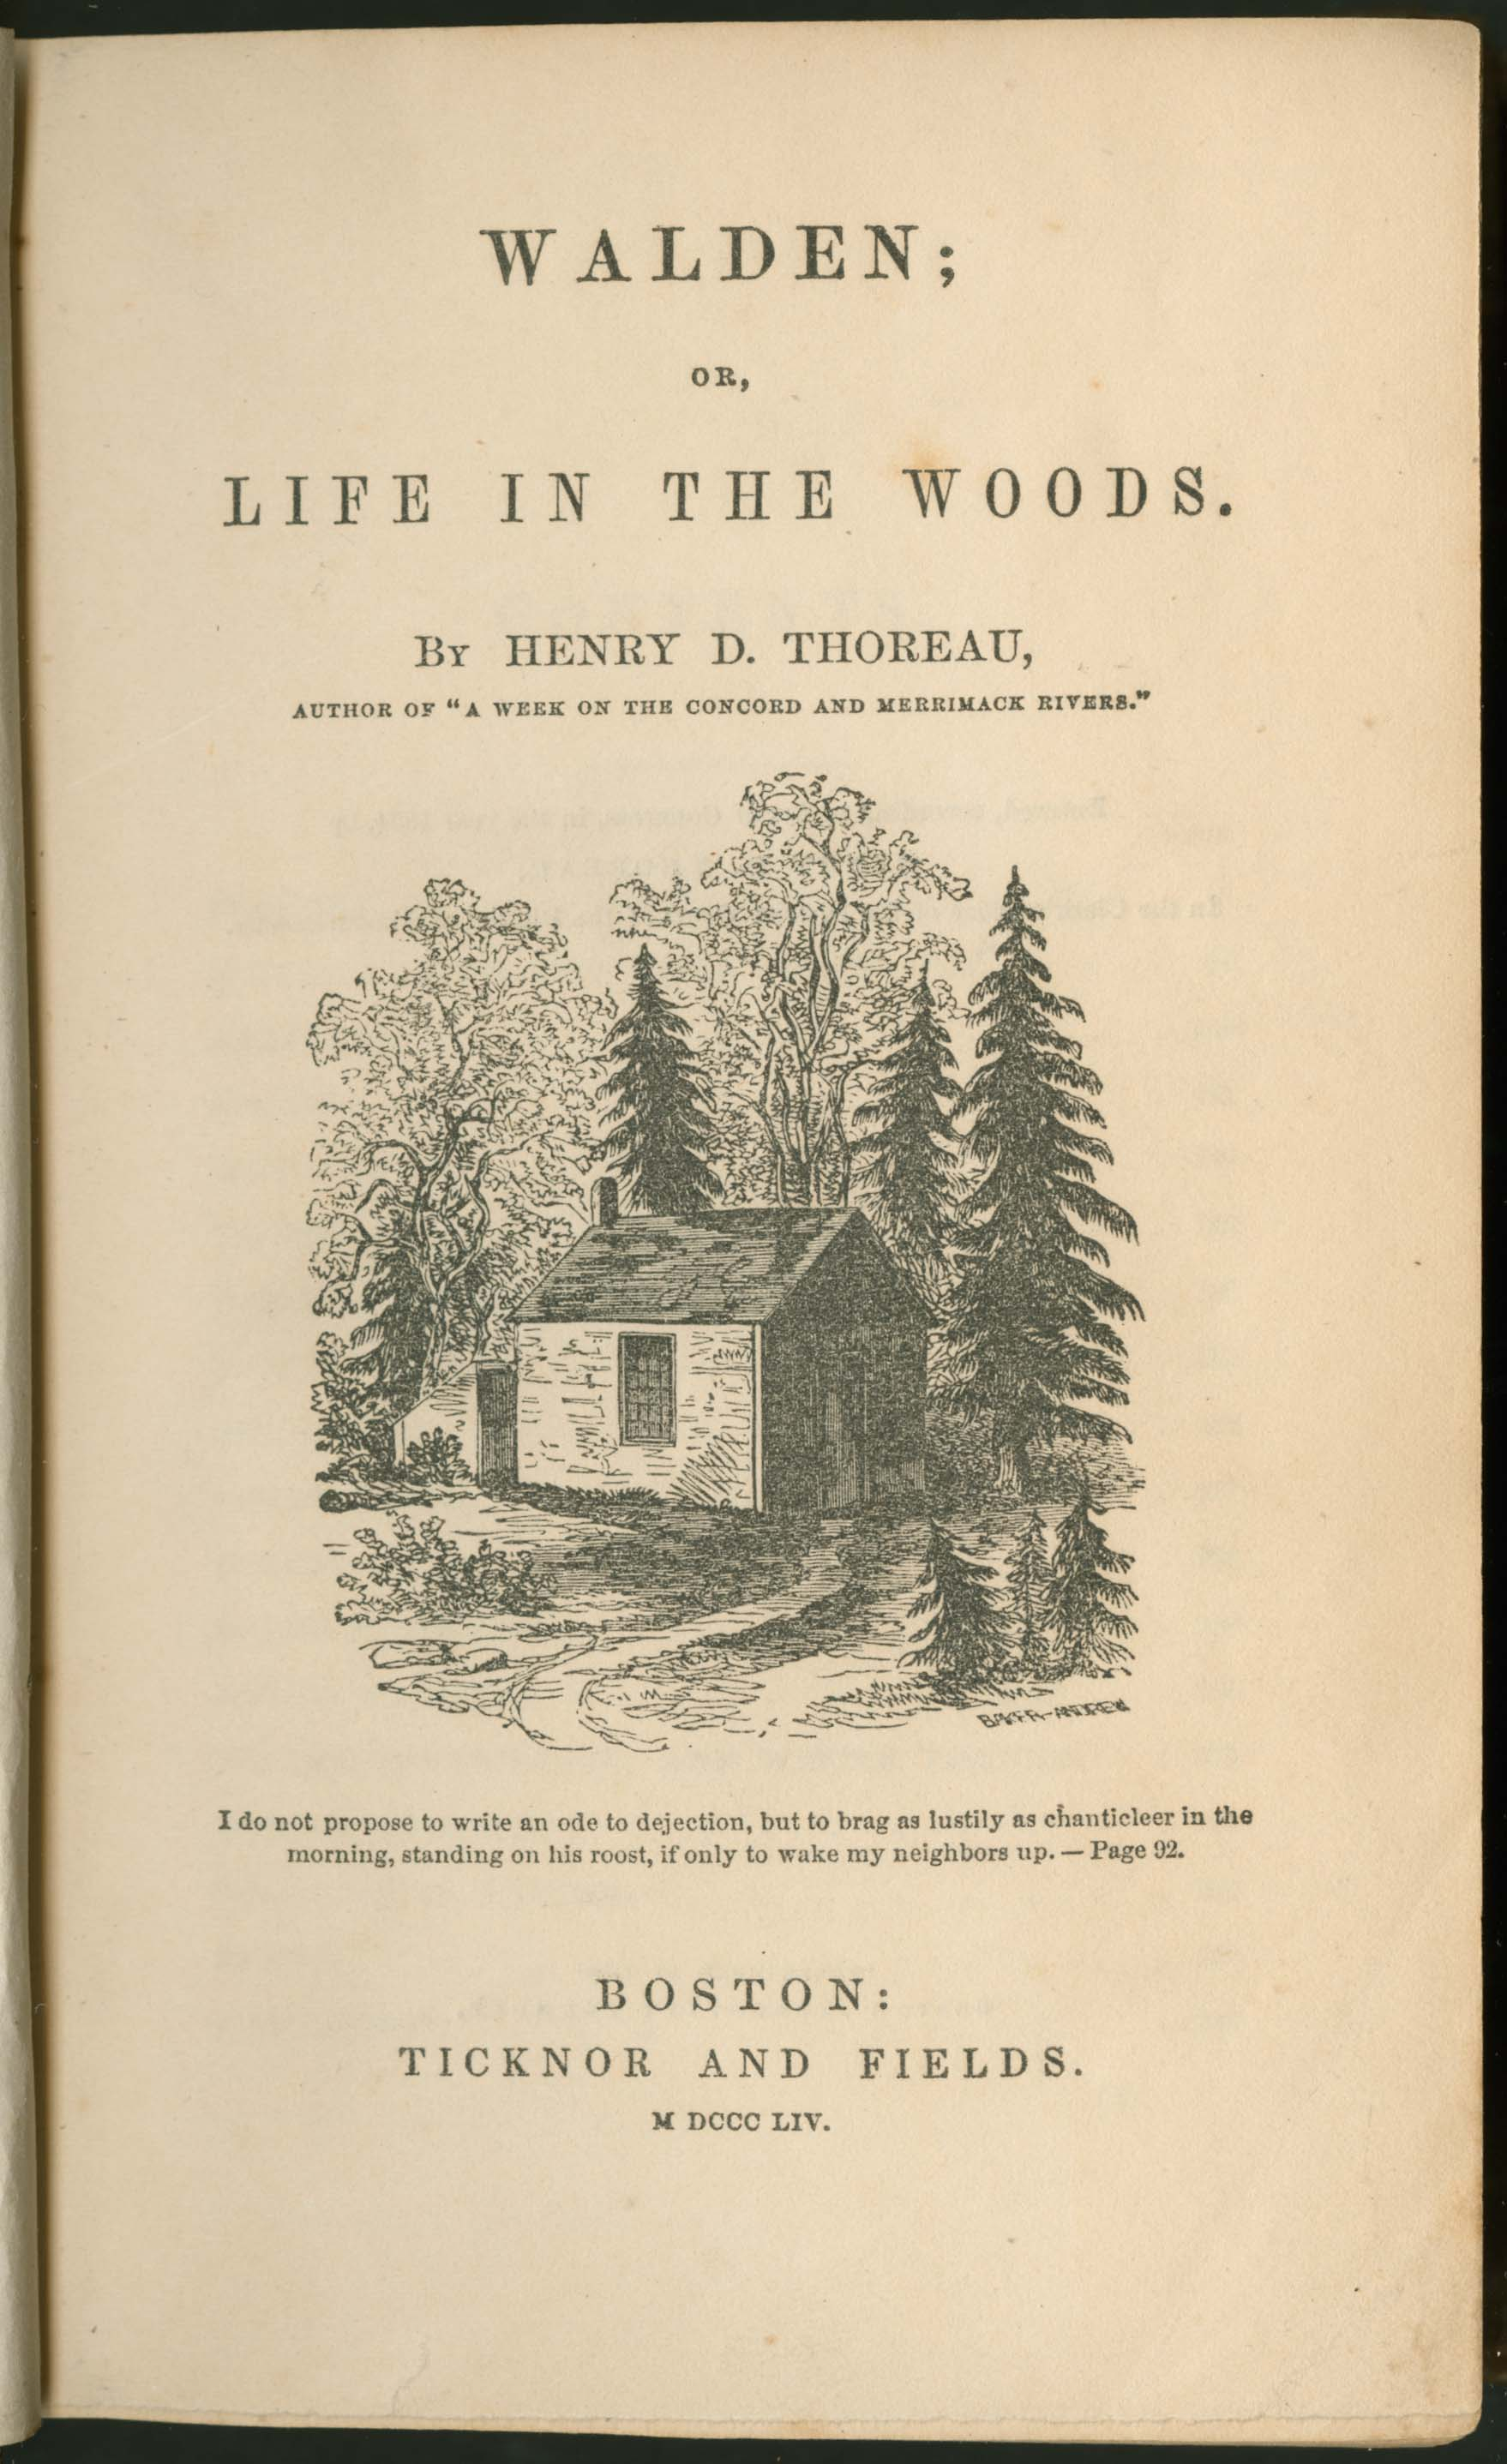 014 818 31 W14 1854 Tp Emerson Essays Essay Dreaded Ralph Pdf First Series Summary Waldo Nature Full